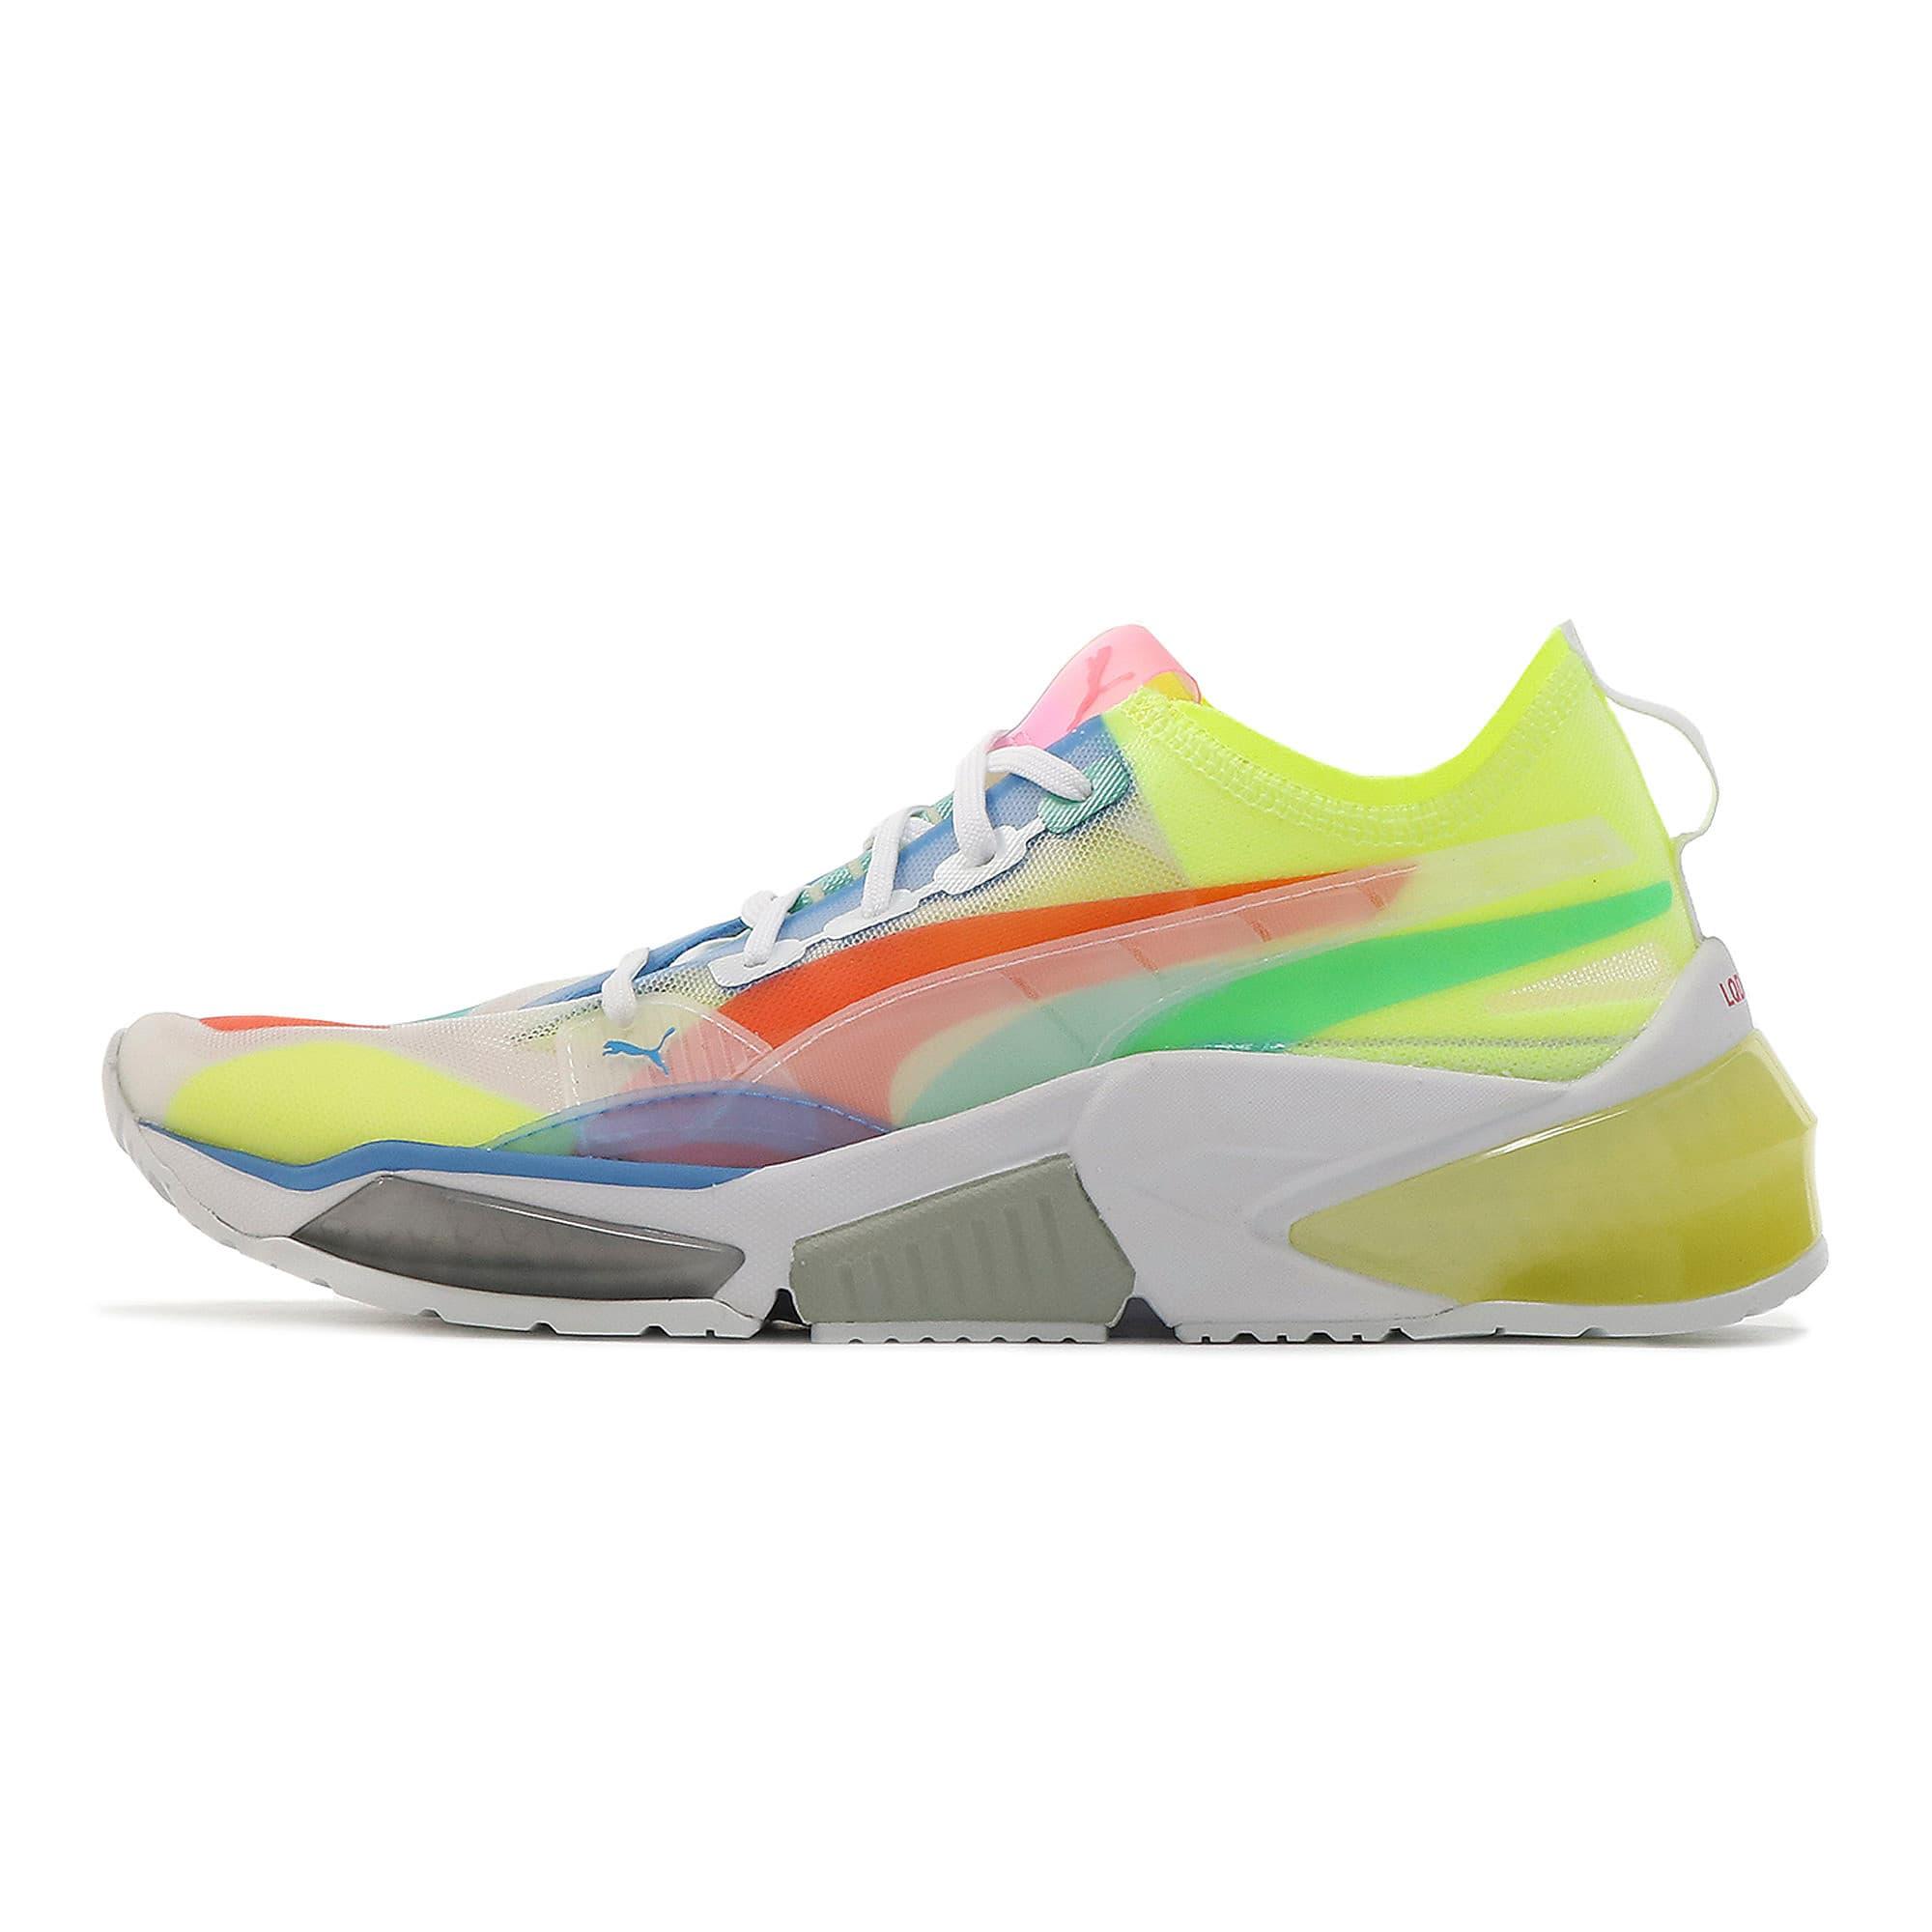 Thumbnail 1 of LQDCELL Optic Sheer Women's Training Shoes, Puma White, medium